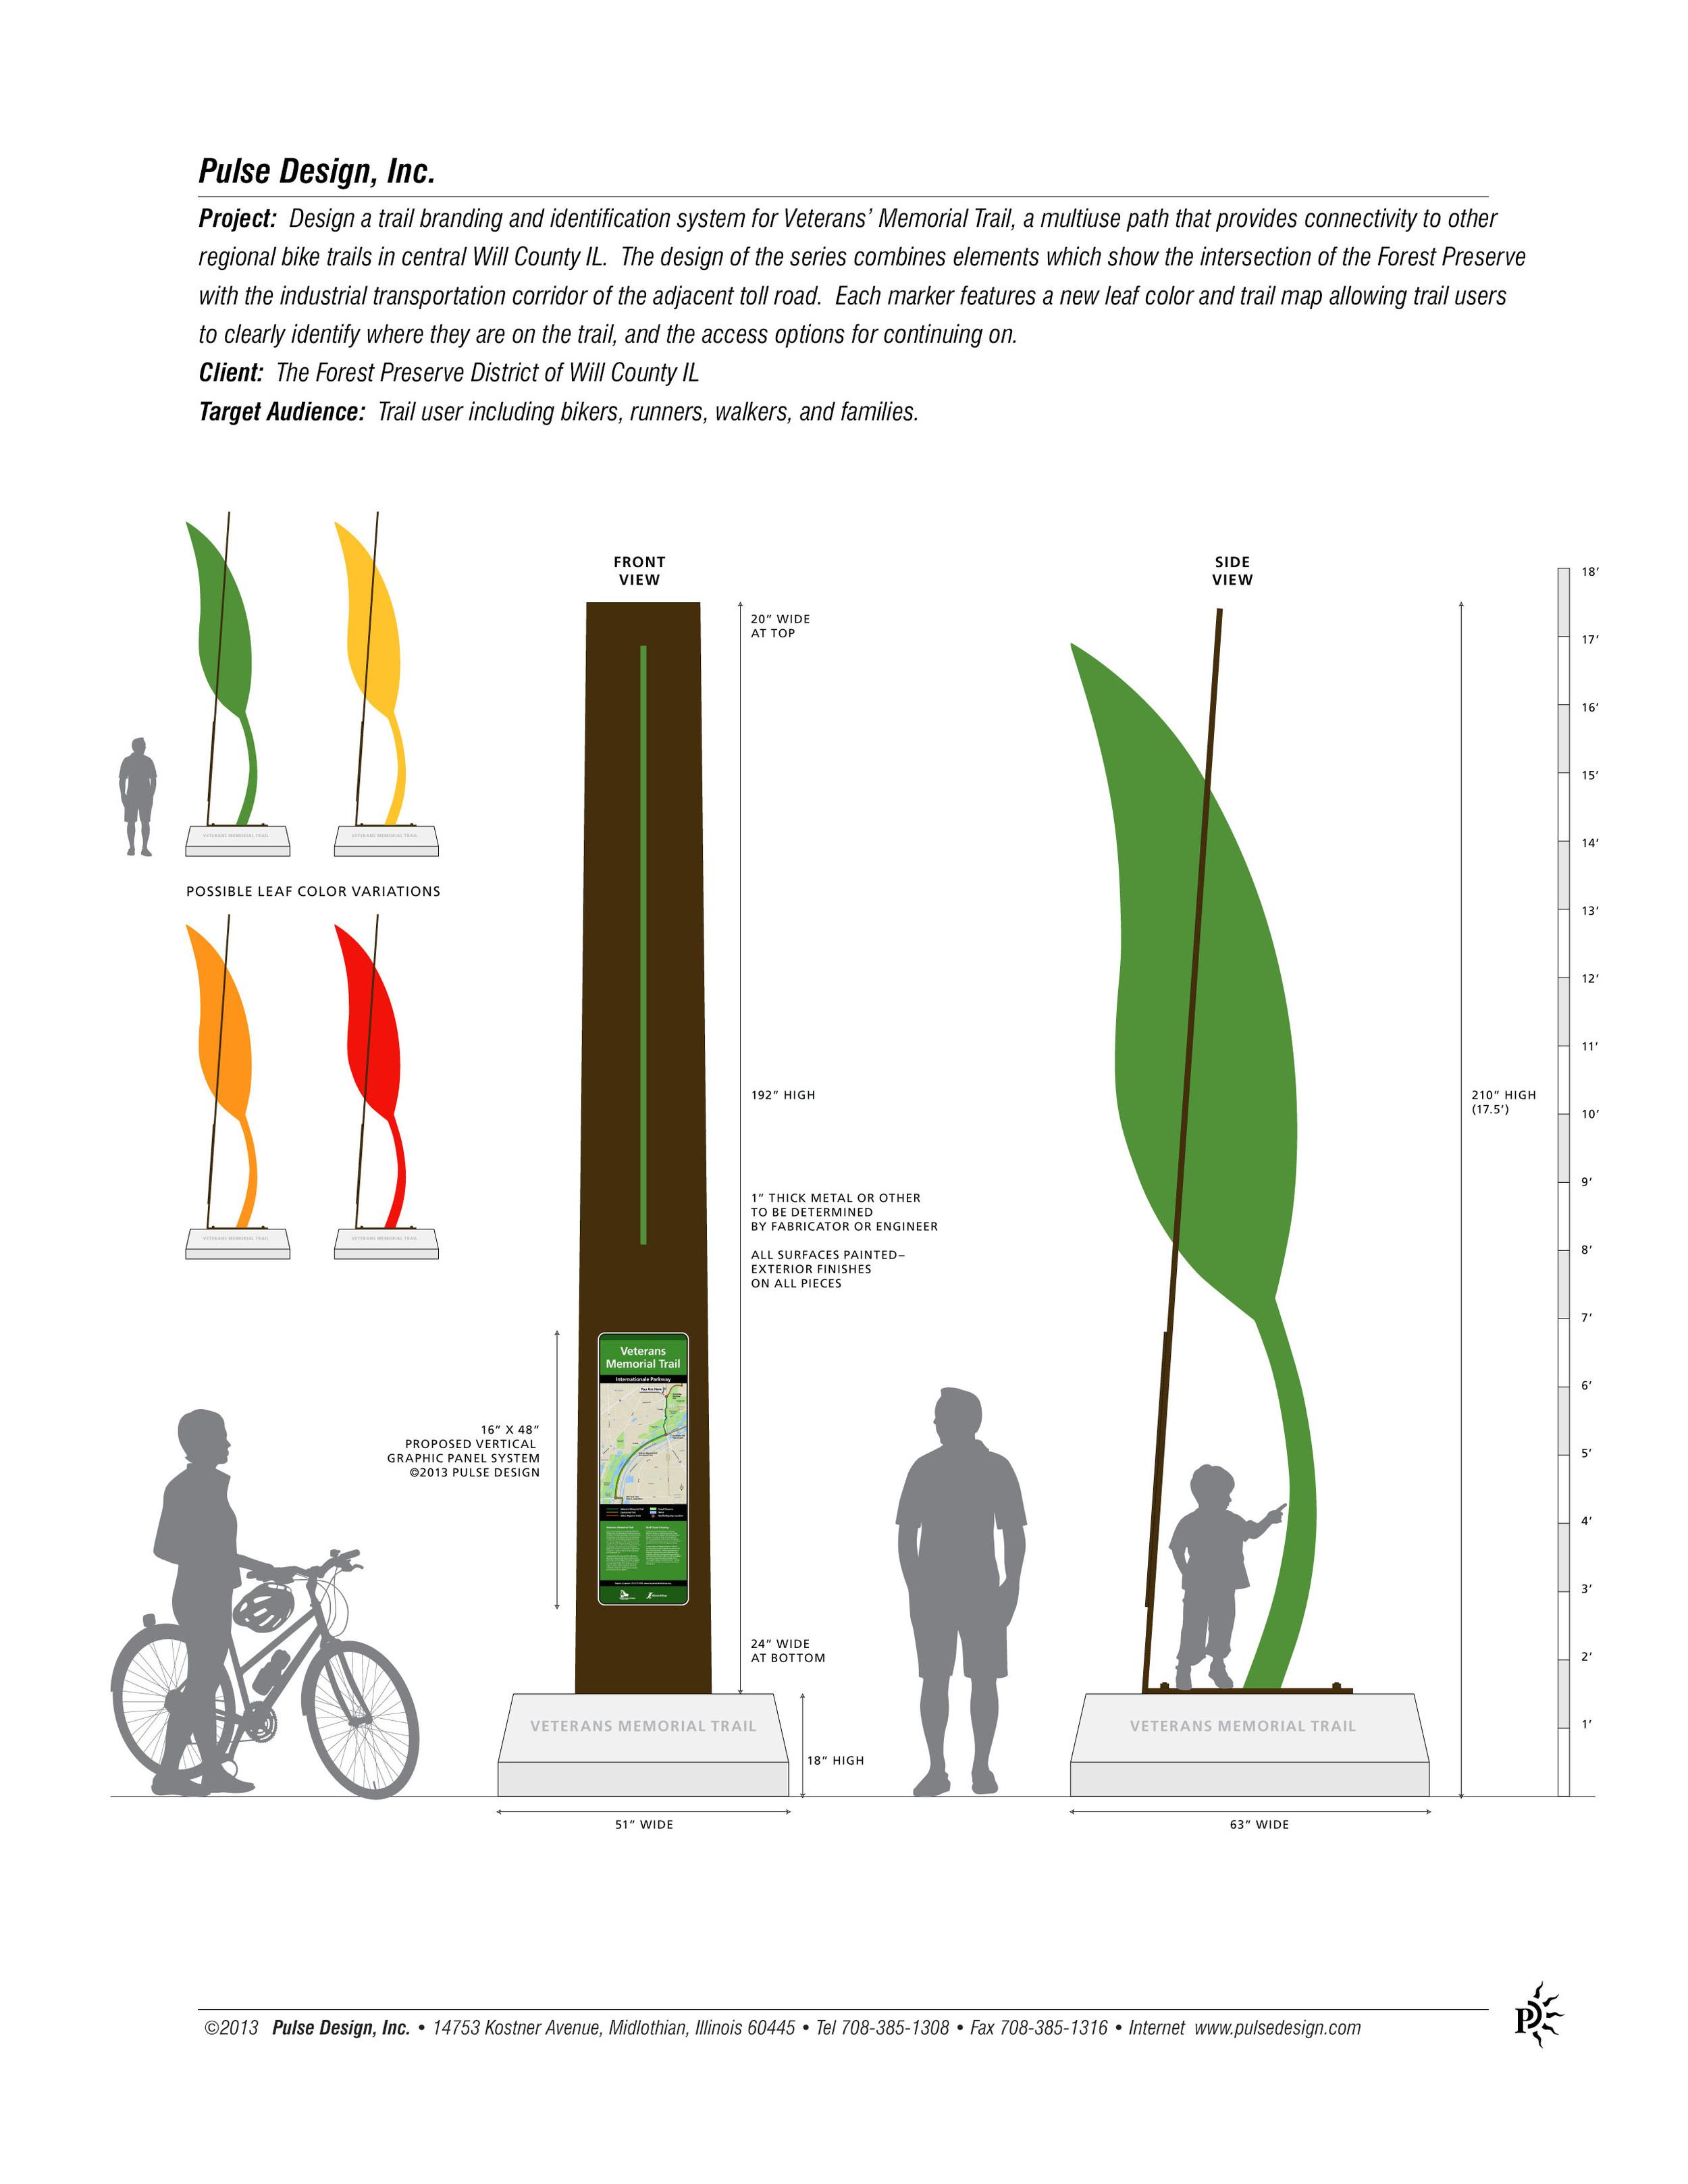 Veterans-Memorial-Trail-Sign-Plans-Pulse-Design-Inc.jpg